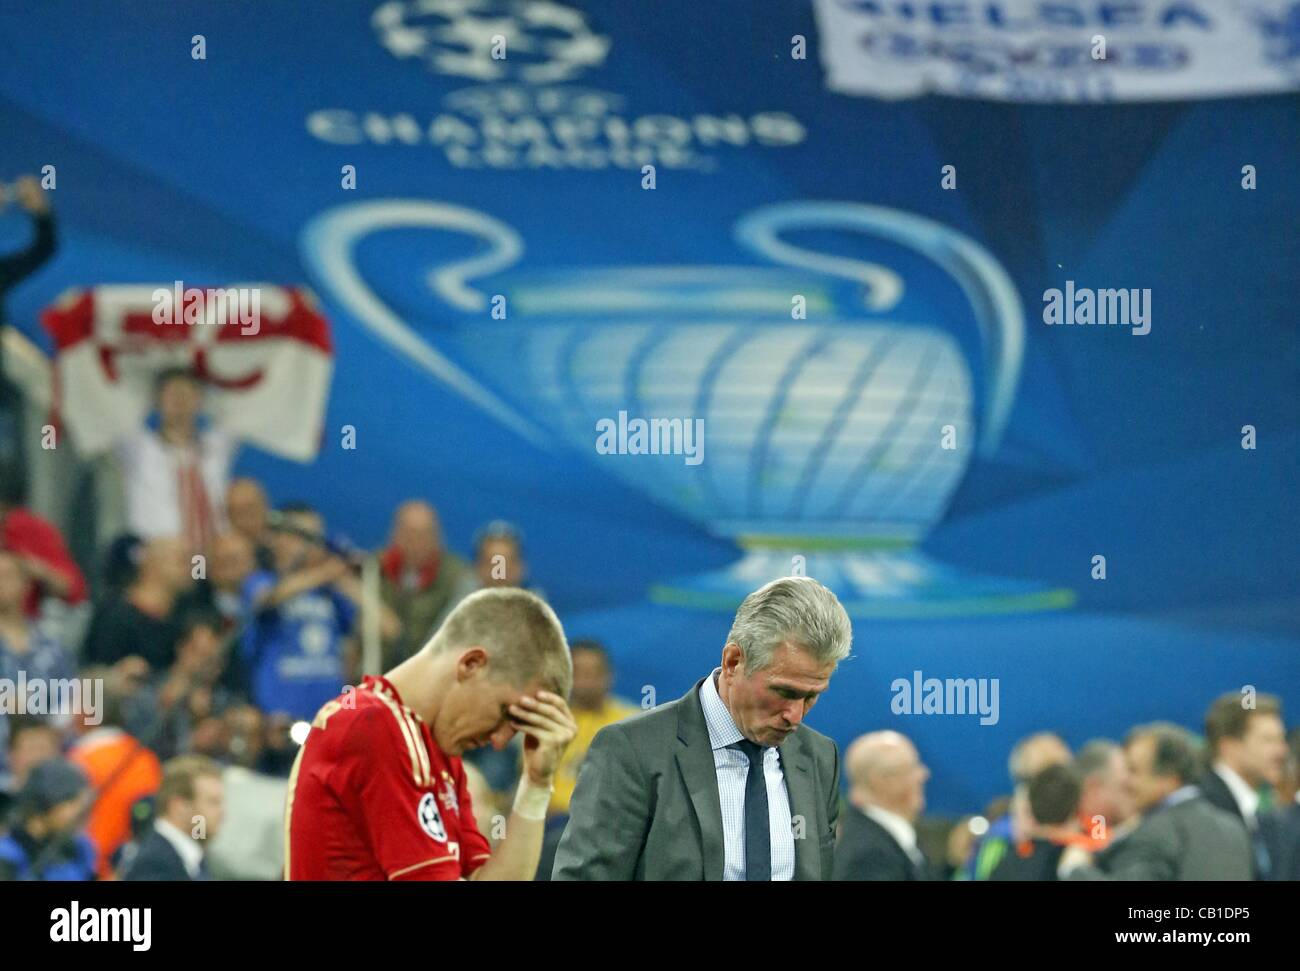 Bastian Schweinsteiger (Bayern #31) , Trainer Cheftrainer Jupp HEYNCKES (FCB) Emotionen, enttäuscht, Enttäuschung, - Stock Image